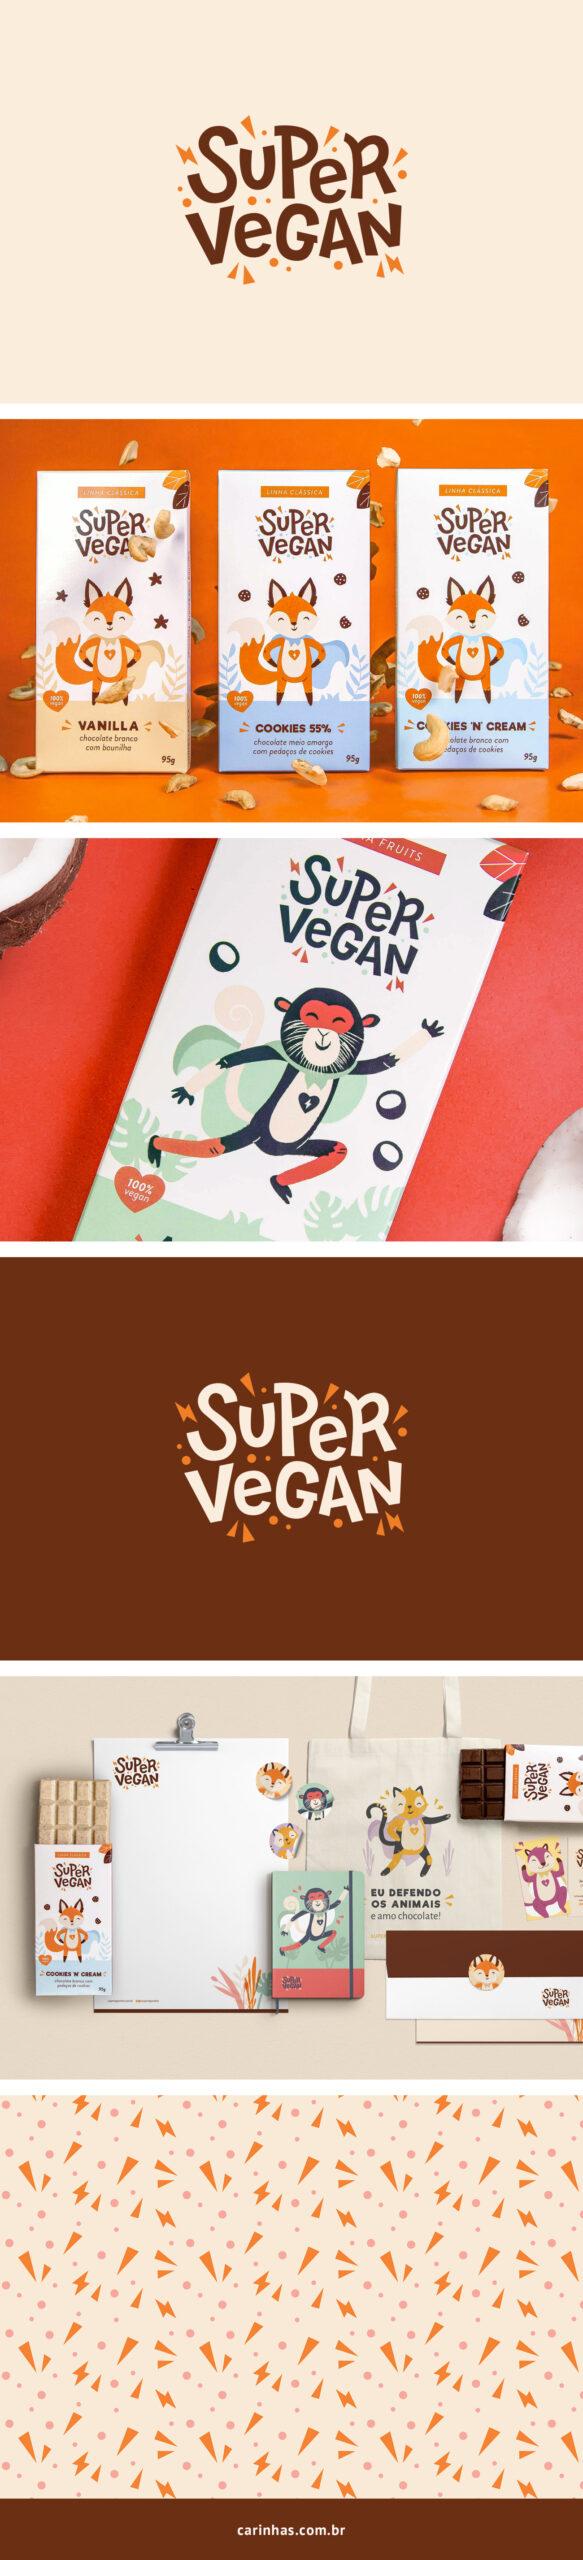 Super Vegan - Projeto de Marca Apaixonante para chocolate vegano